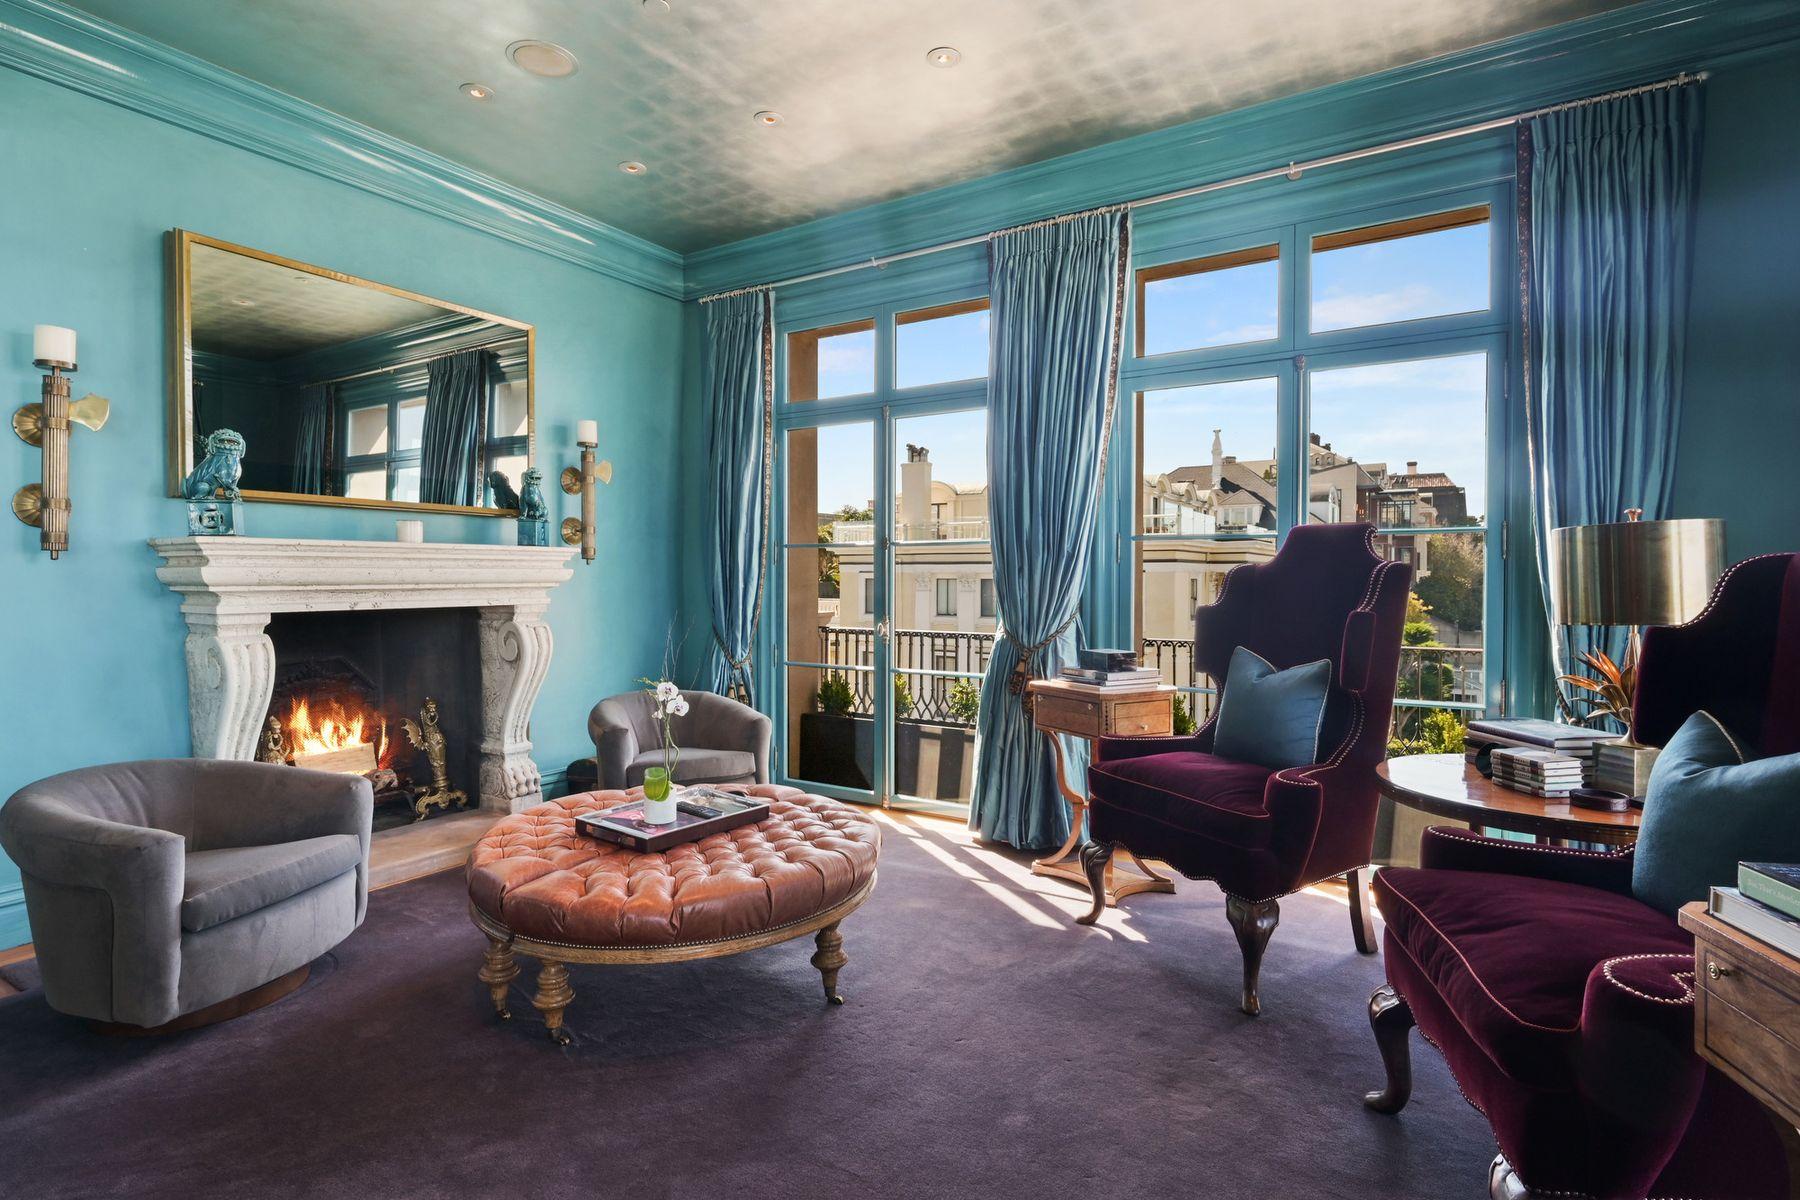 Additional photo for property listing at Bay View Mansion On Legendary Gold Coast 2799 Broadway 旧金山, 加利福尼亚州 94115 美国